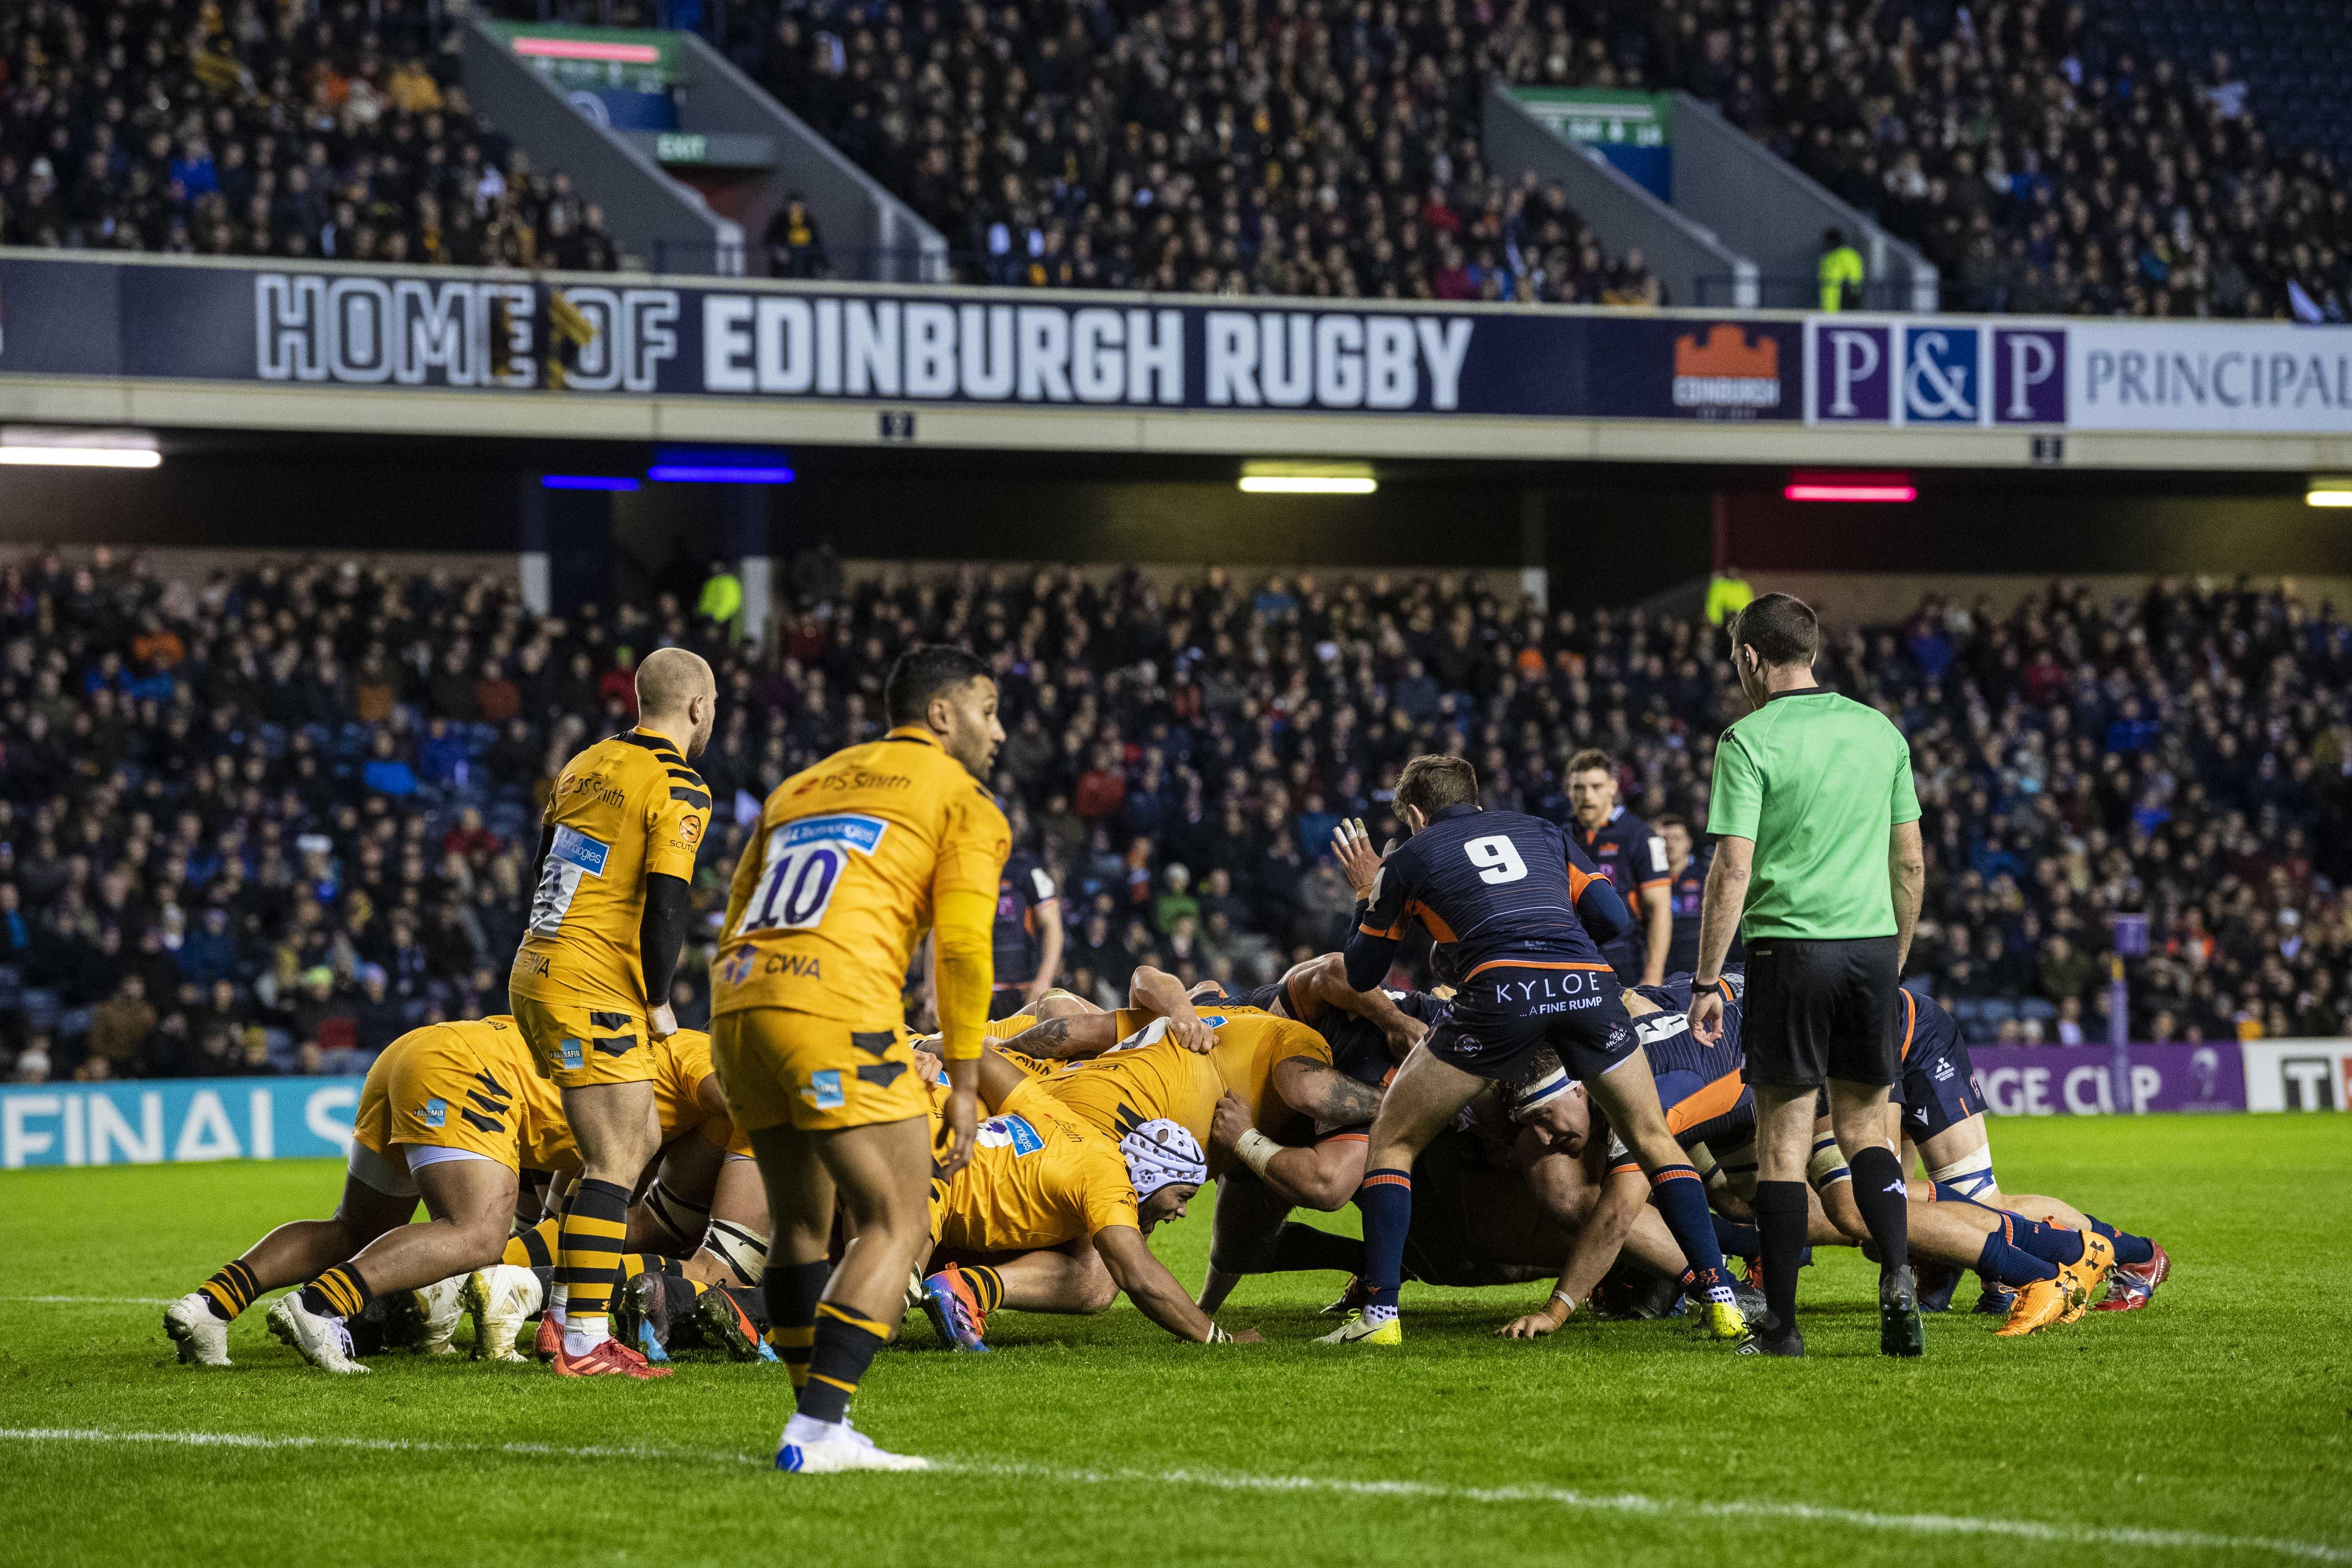 Edinburgh's scrum turns the screw on Wasps at Murrayfield.